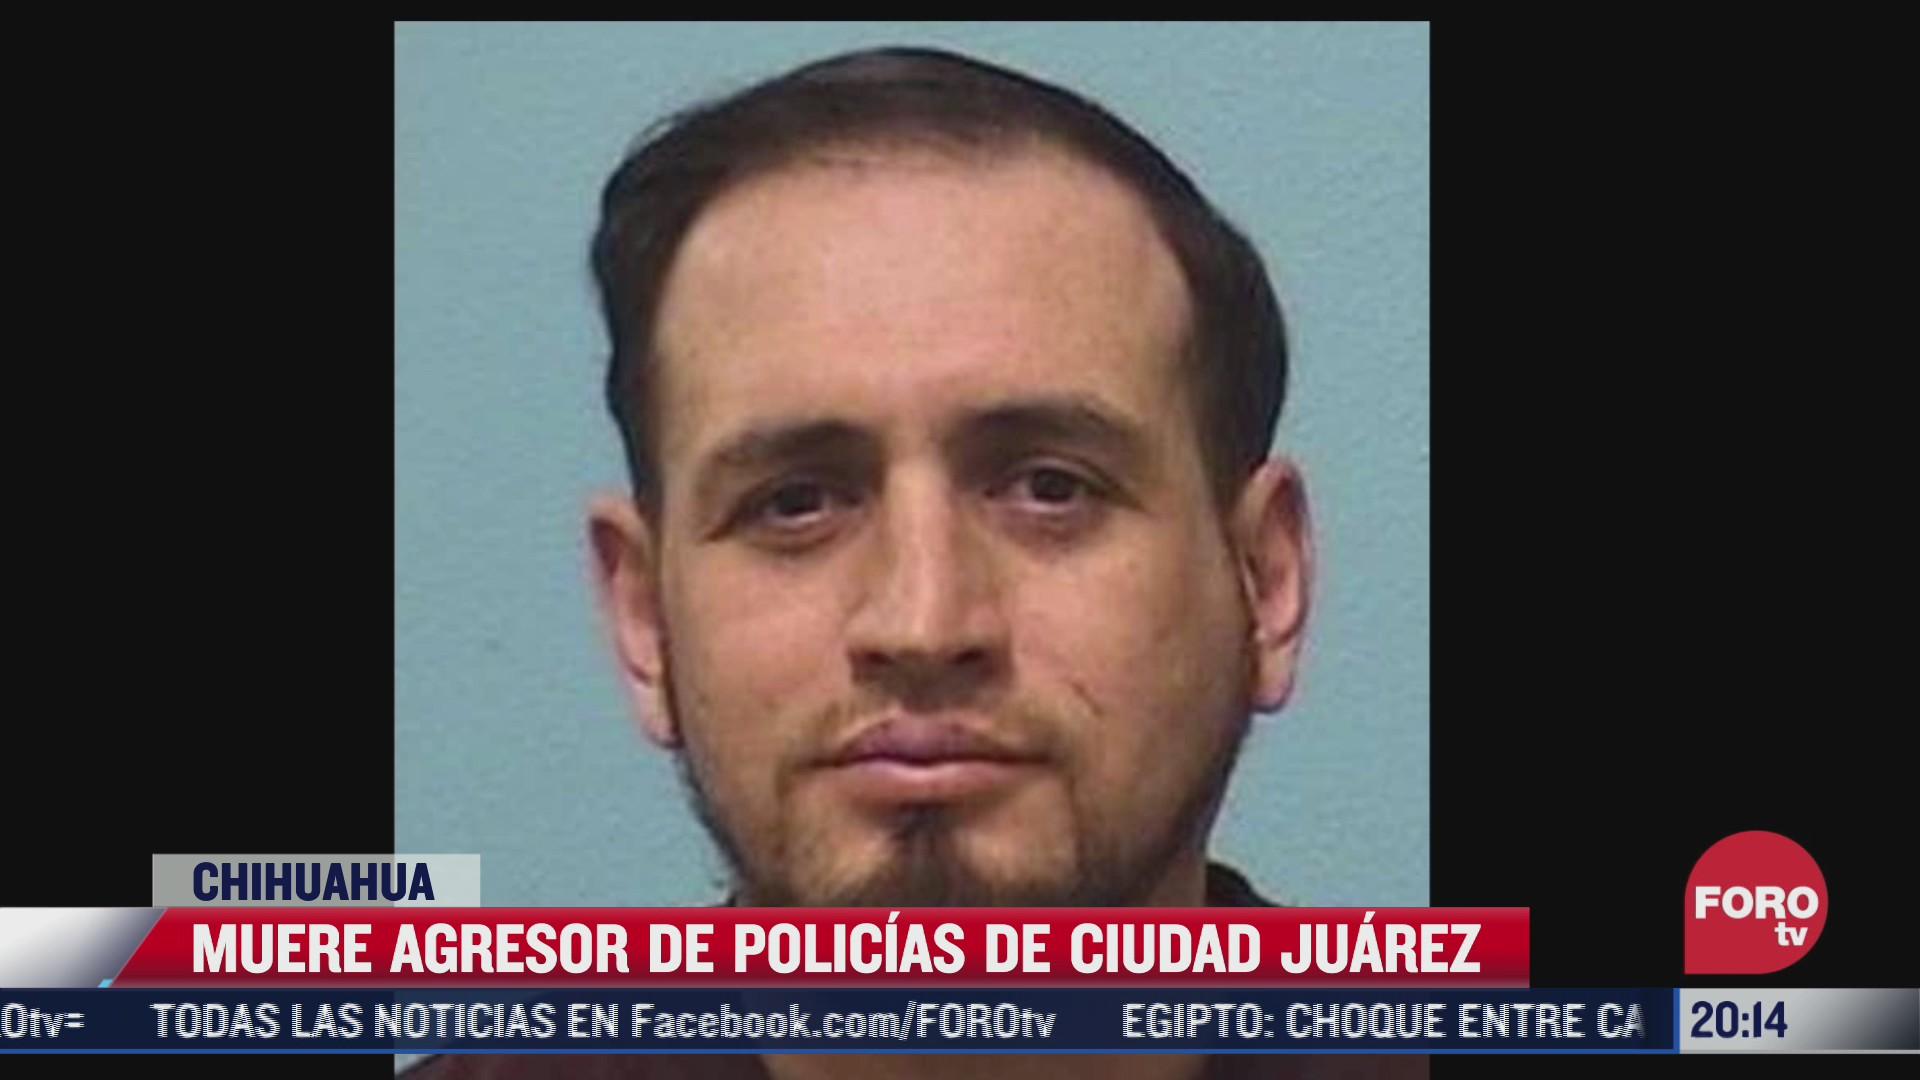 muere agresor de policias de ciudad juarez chihuahua